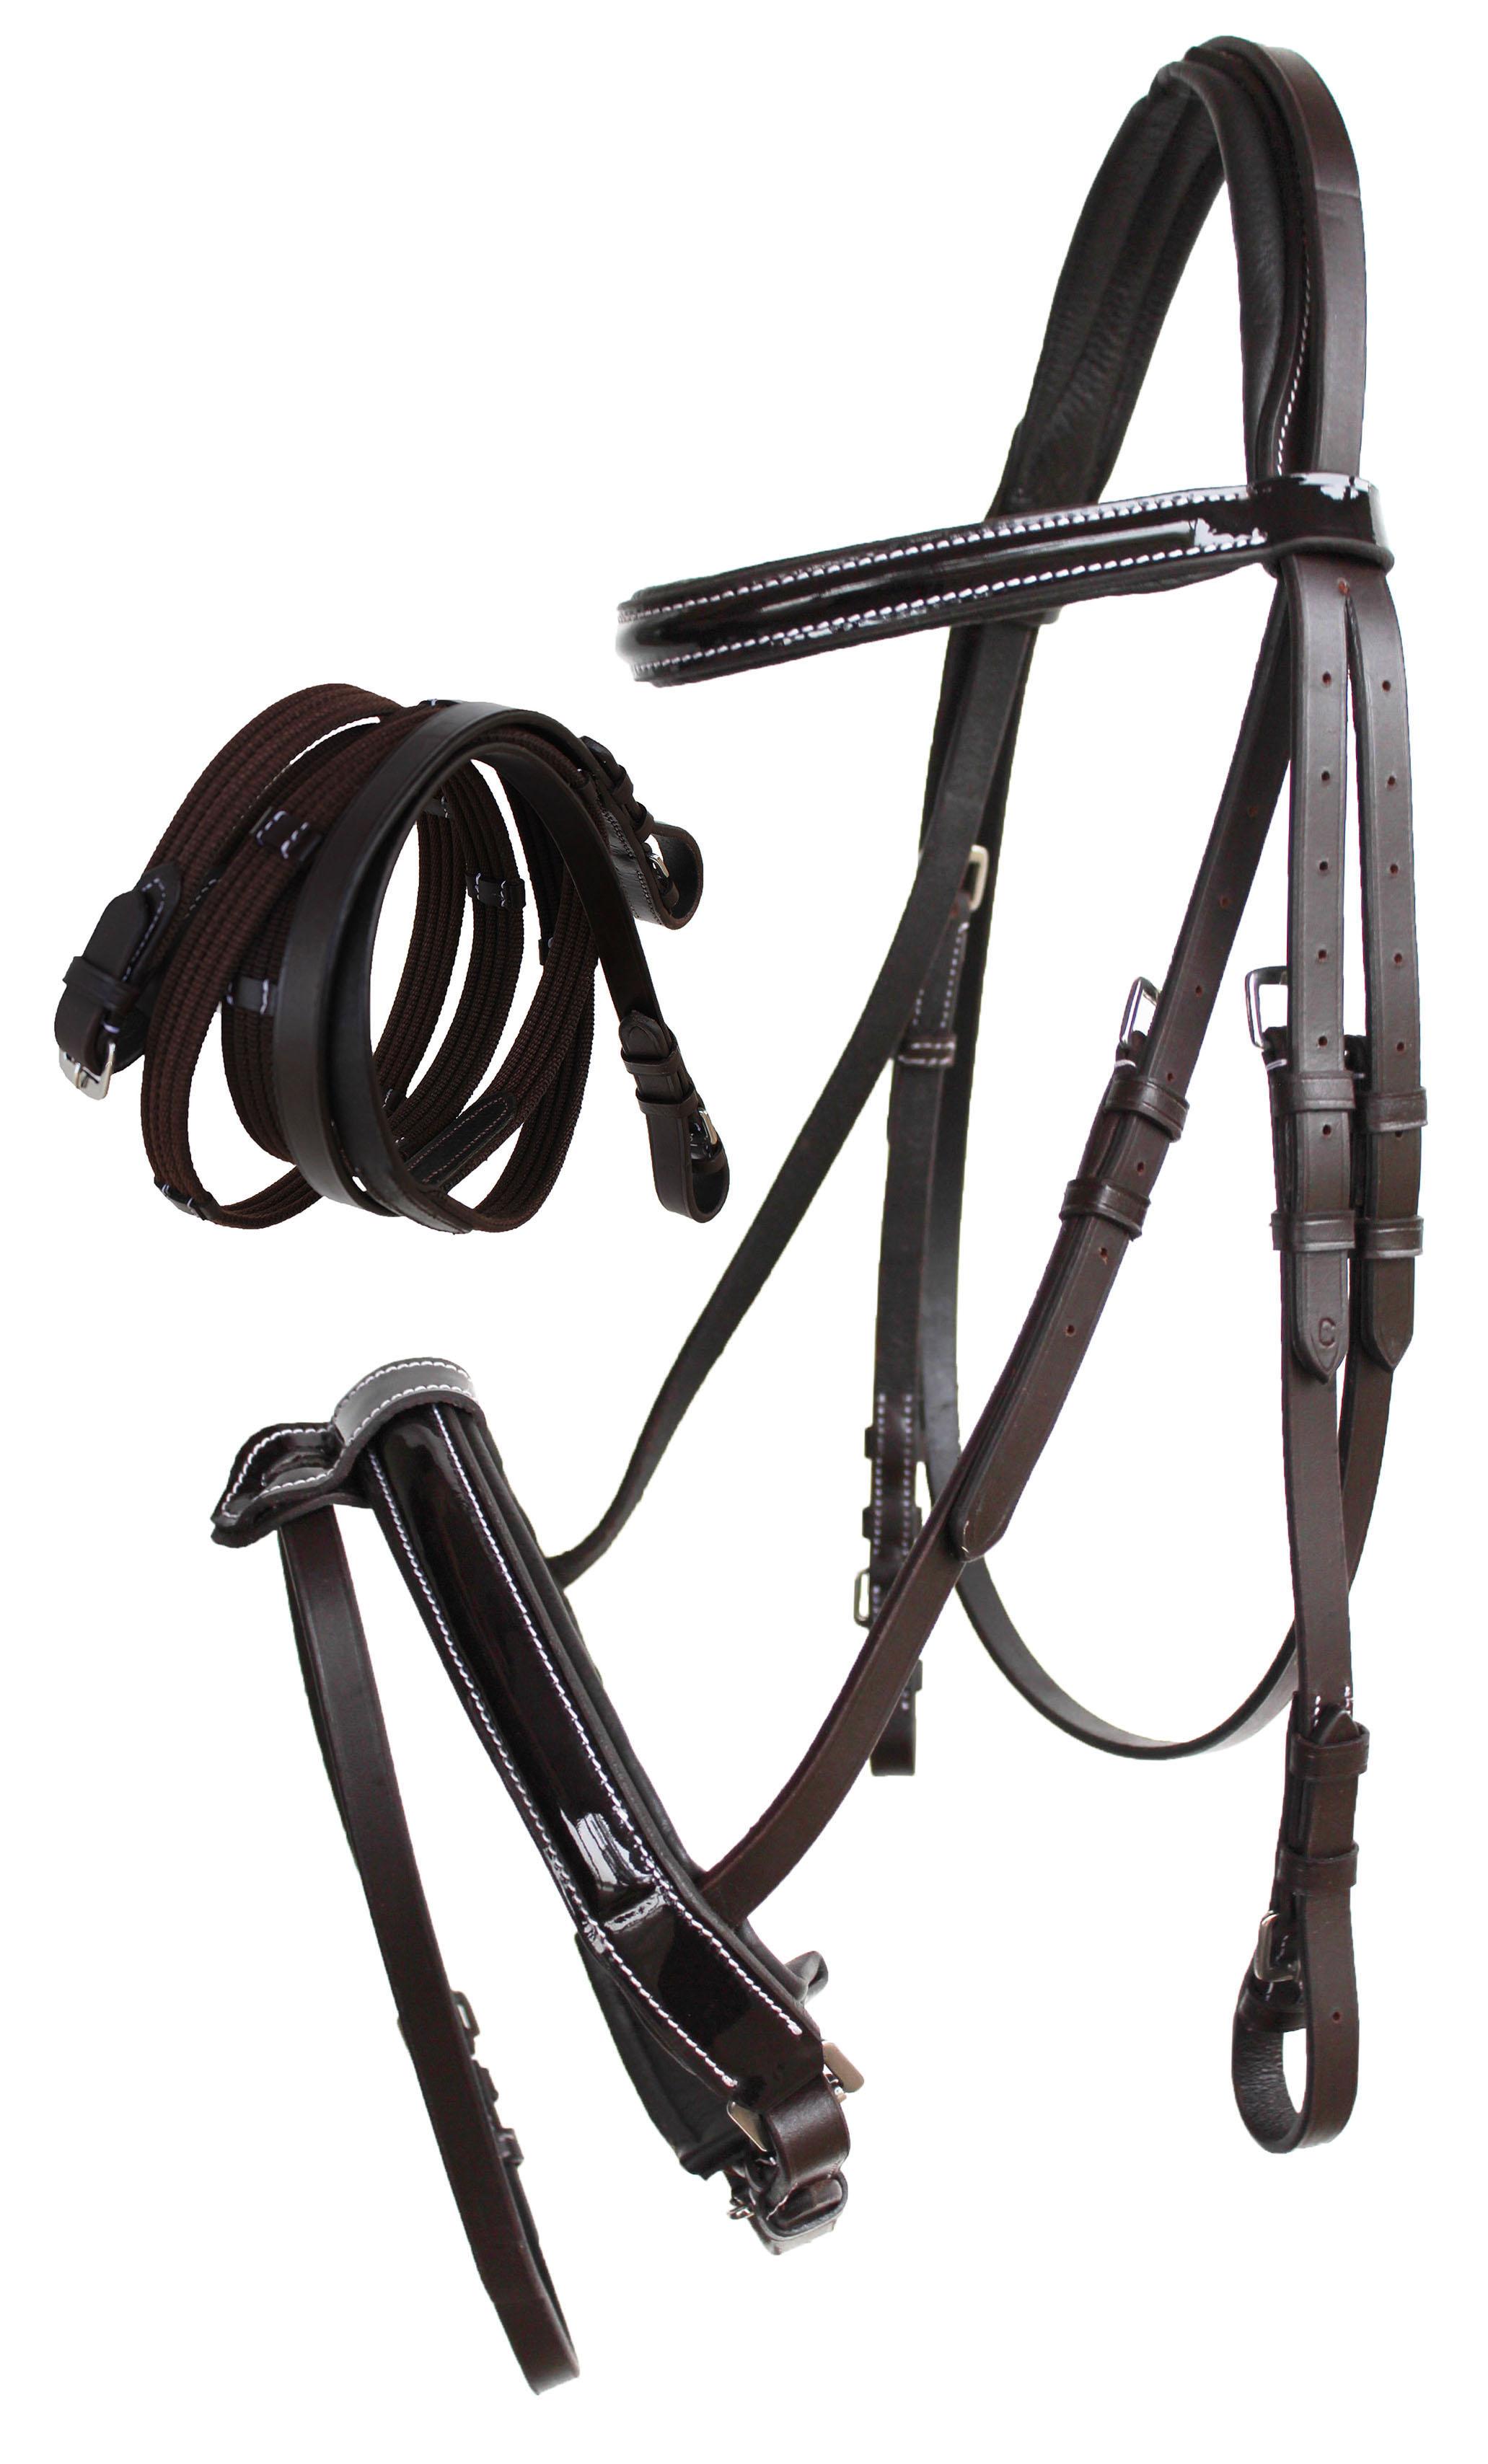 English All-Purpose Trail  Pleasure Leather Bridle Reins 805EB06  hot sales